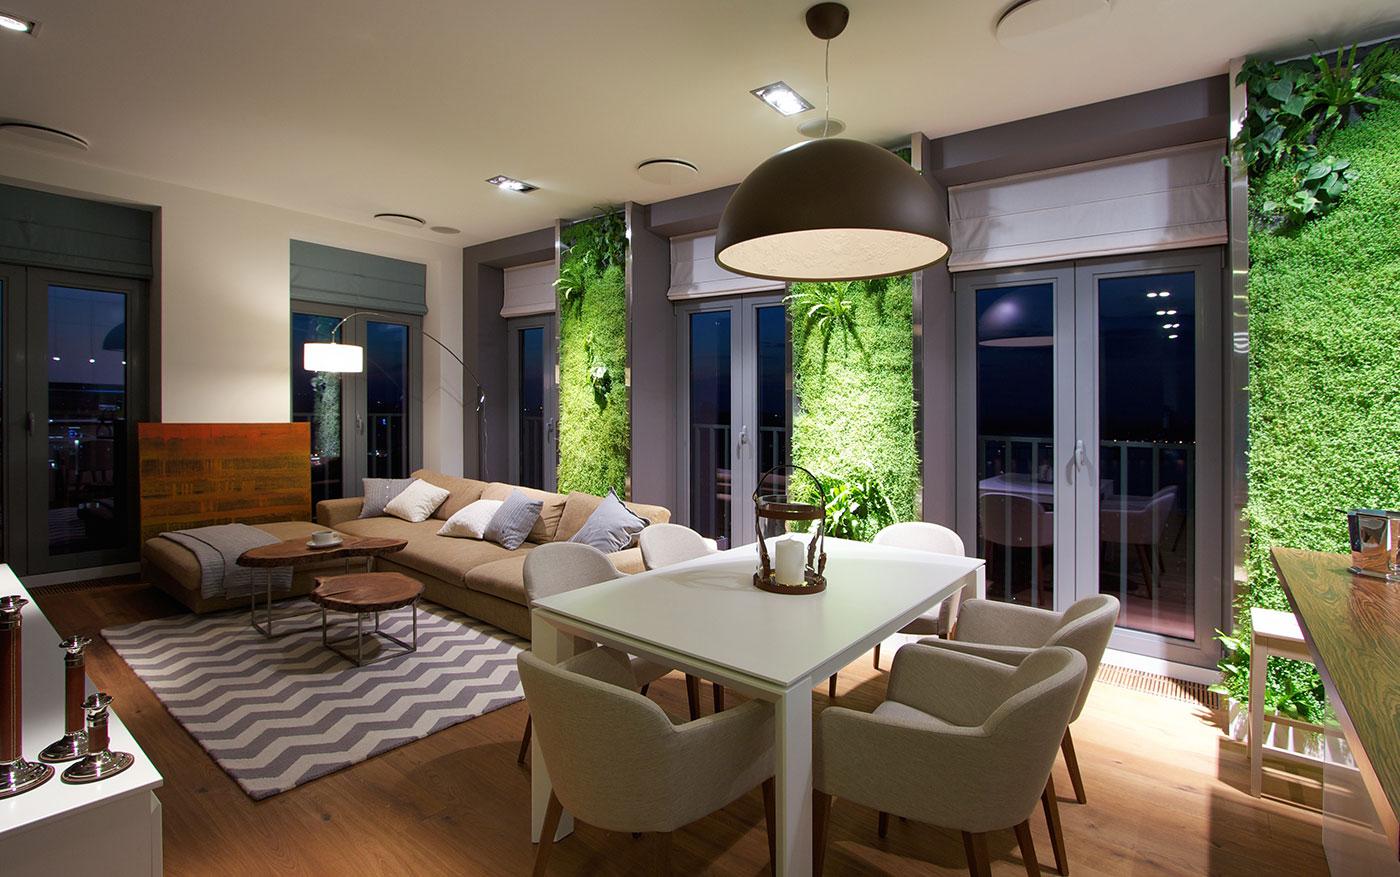 Vertical Gardening Creates An Oasis Inside Contemporary